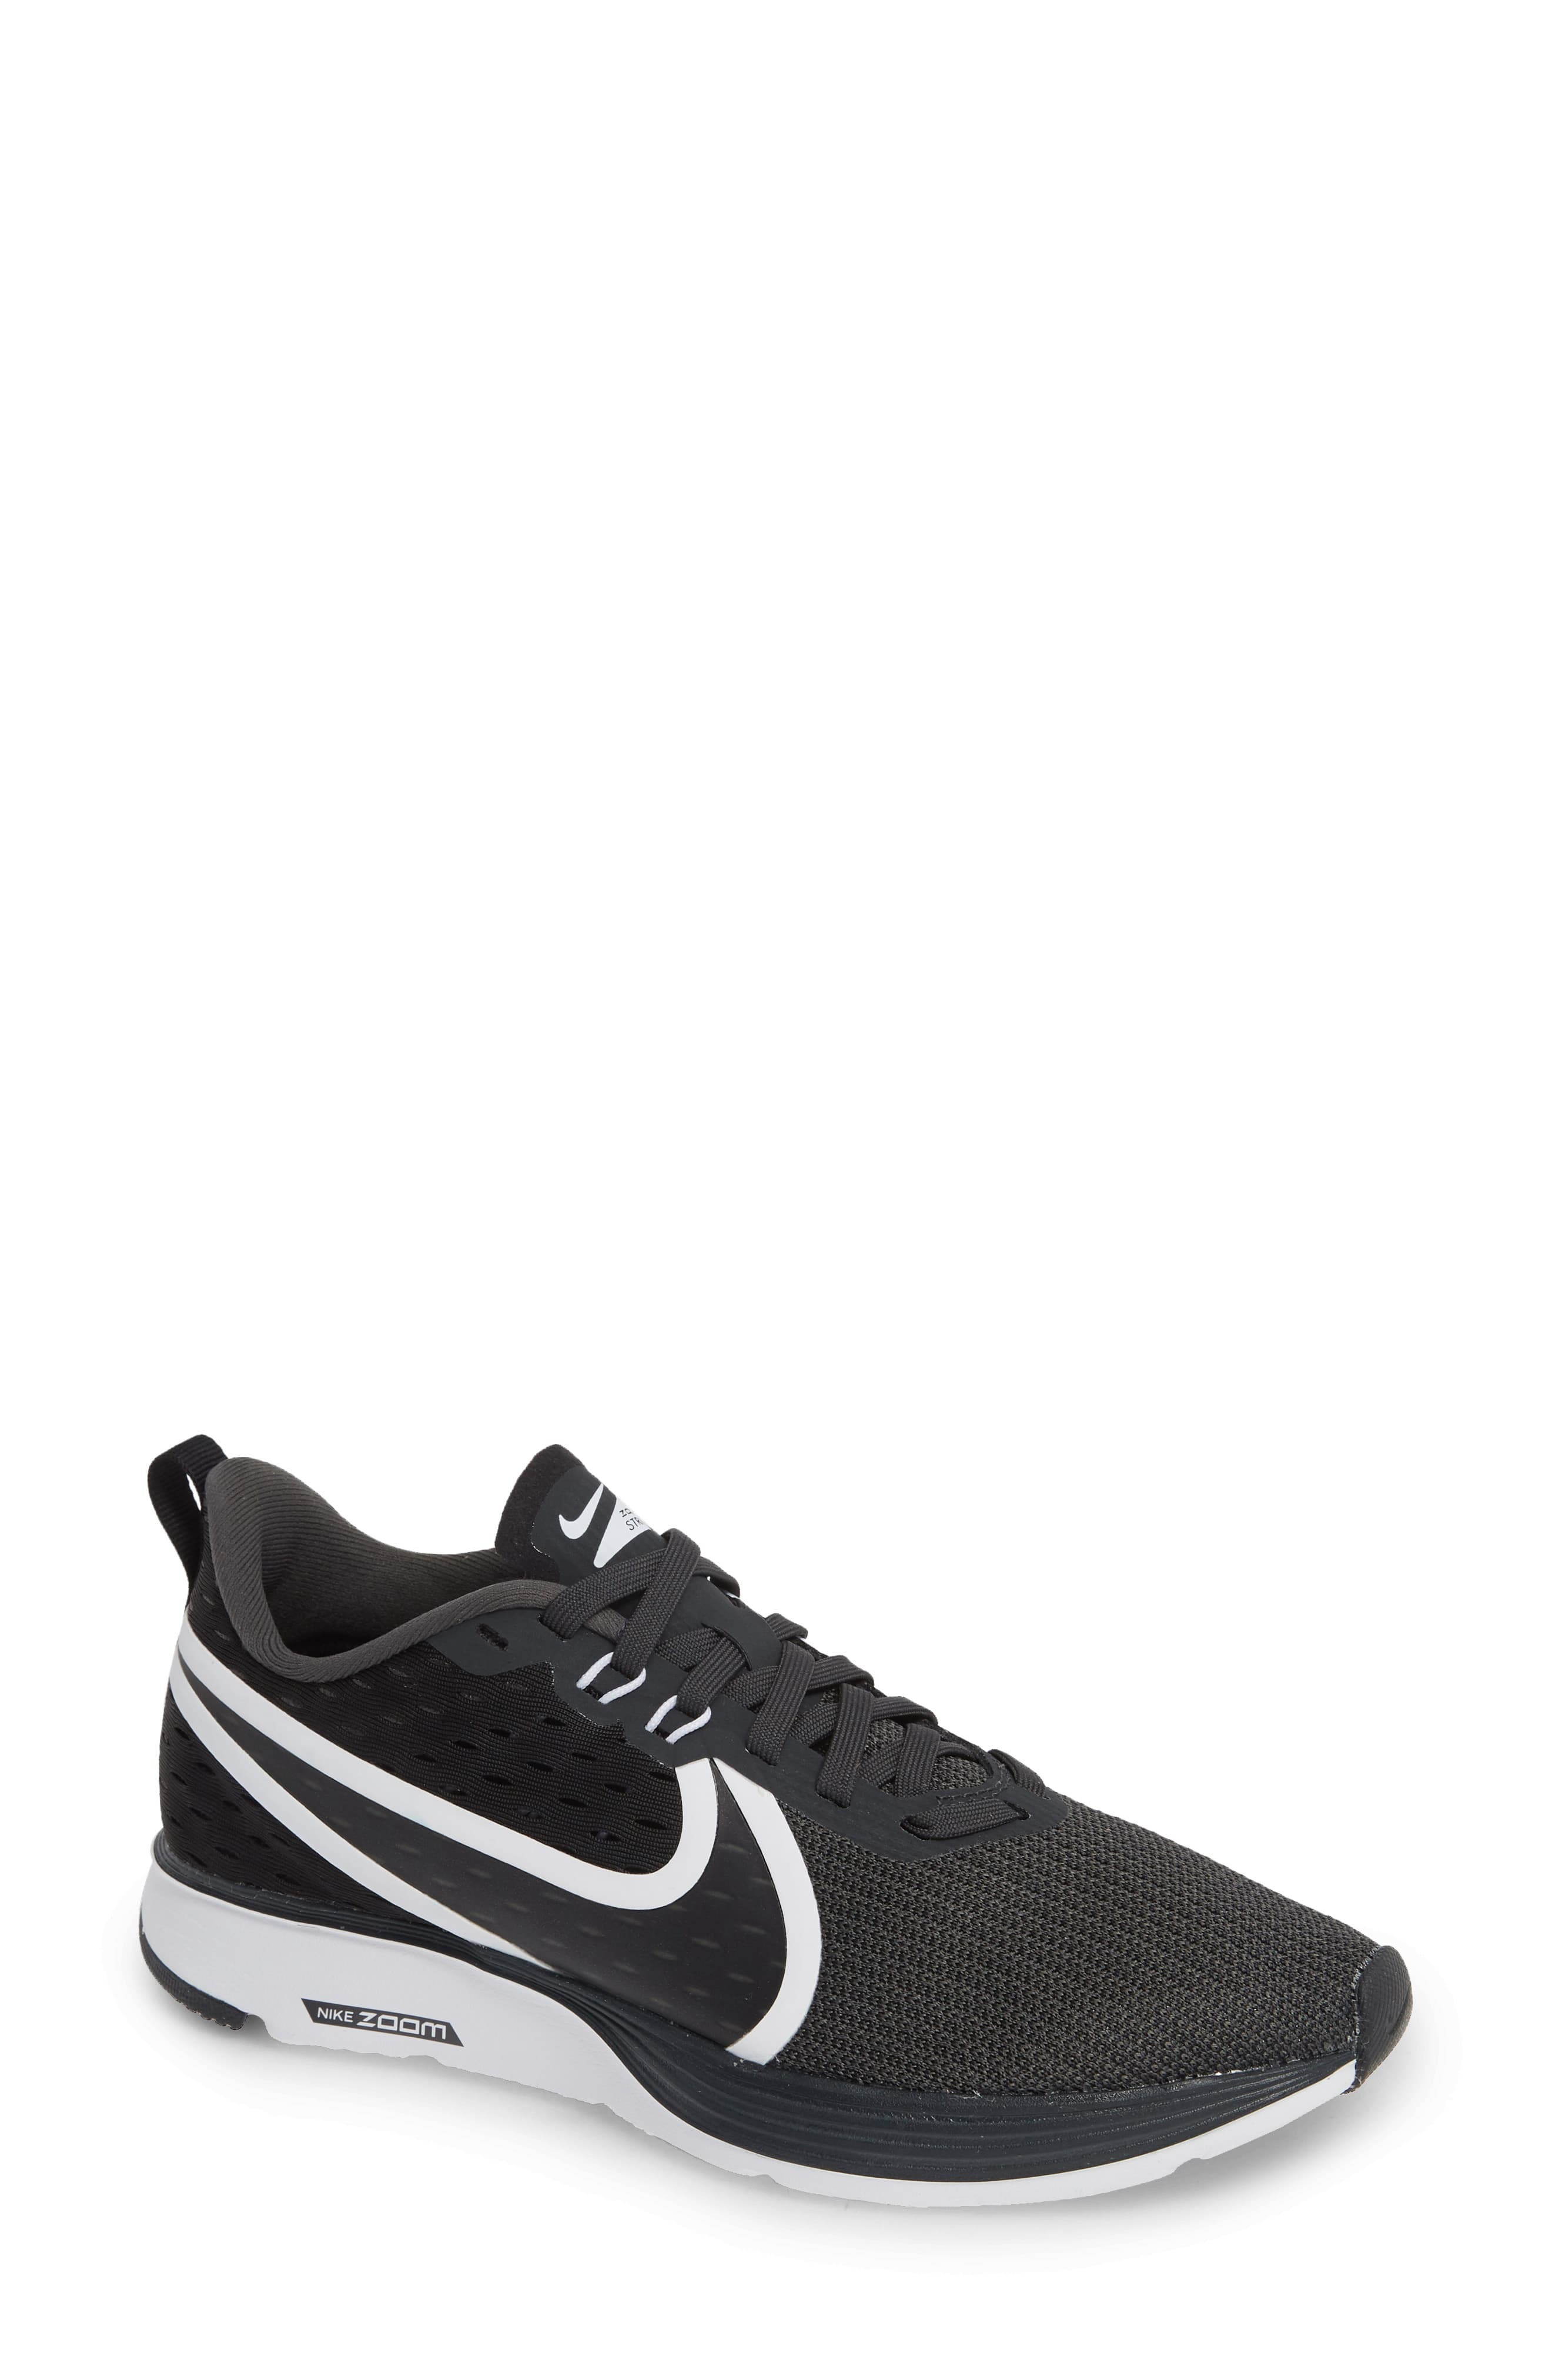 Nike Zoom Strike 2 Running Shoe, $80